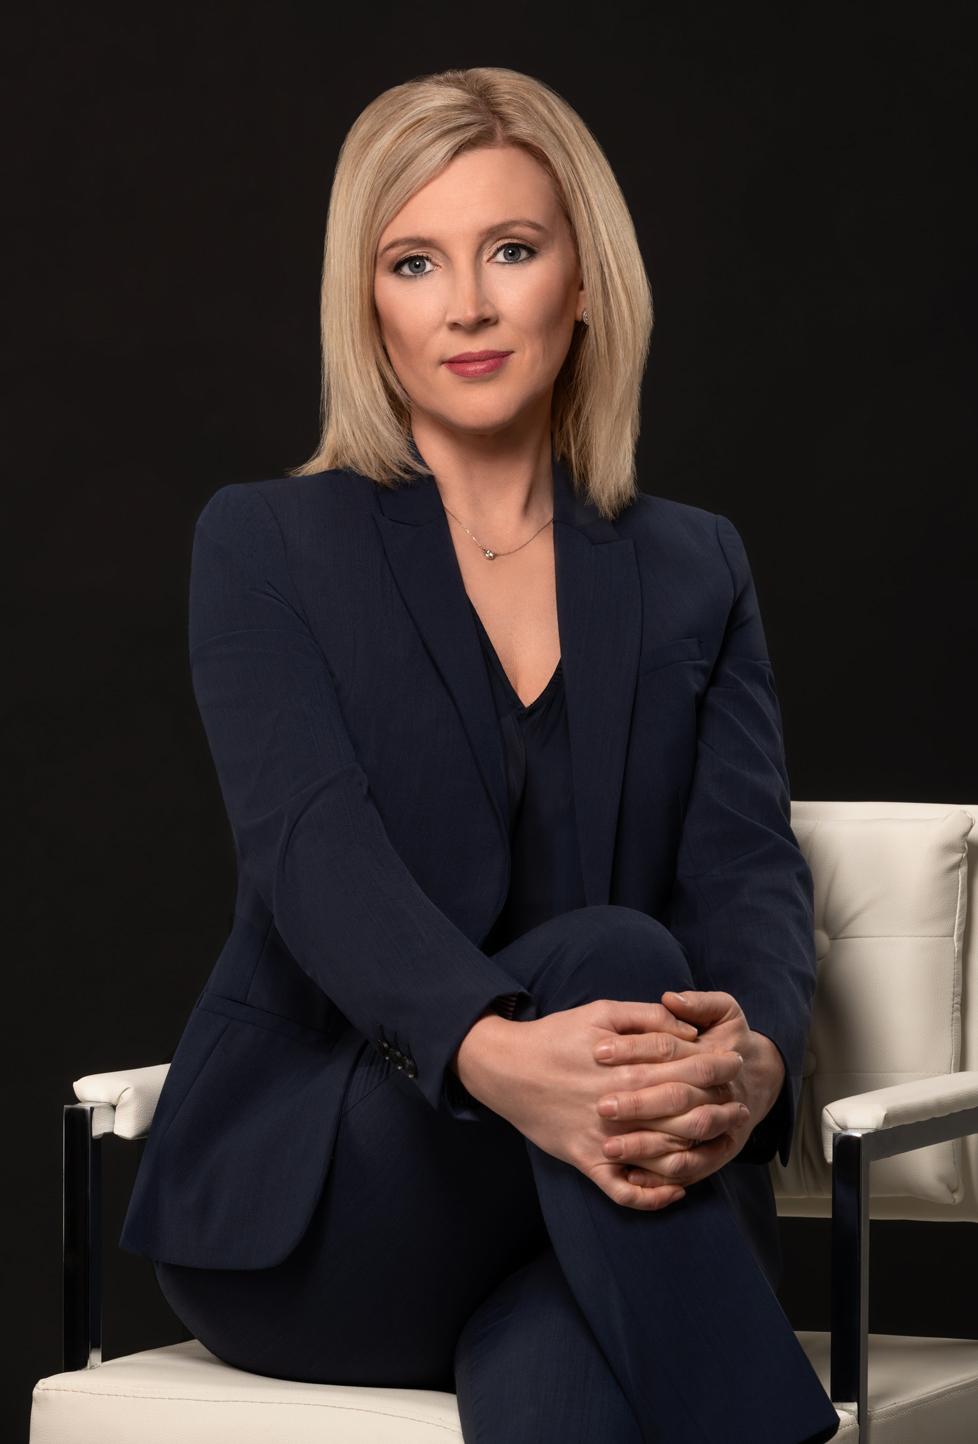 business headshot of a female executive